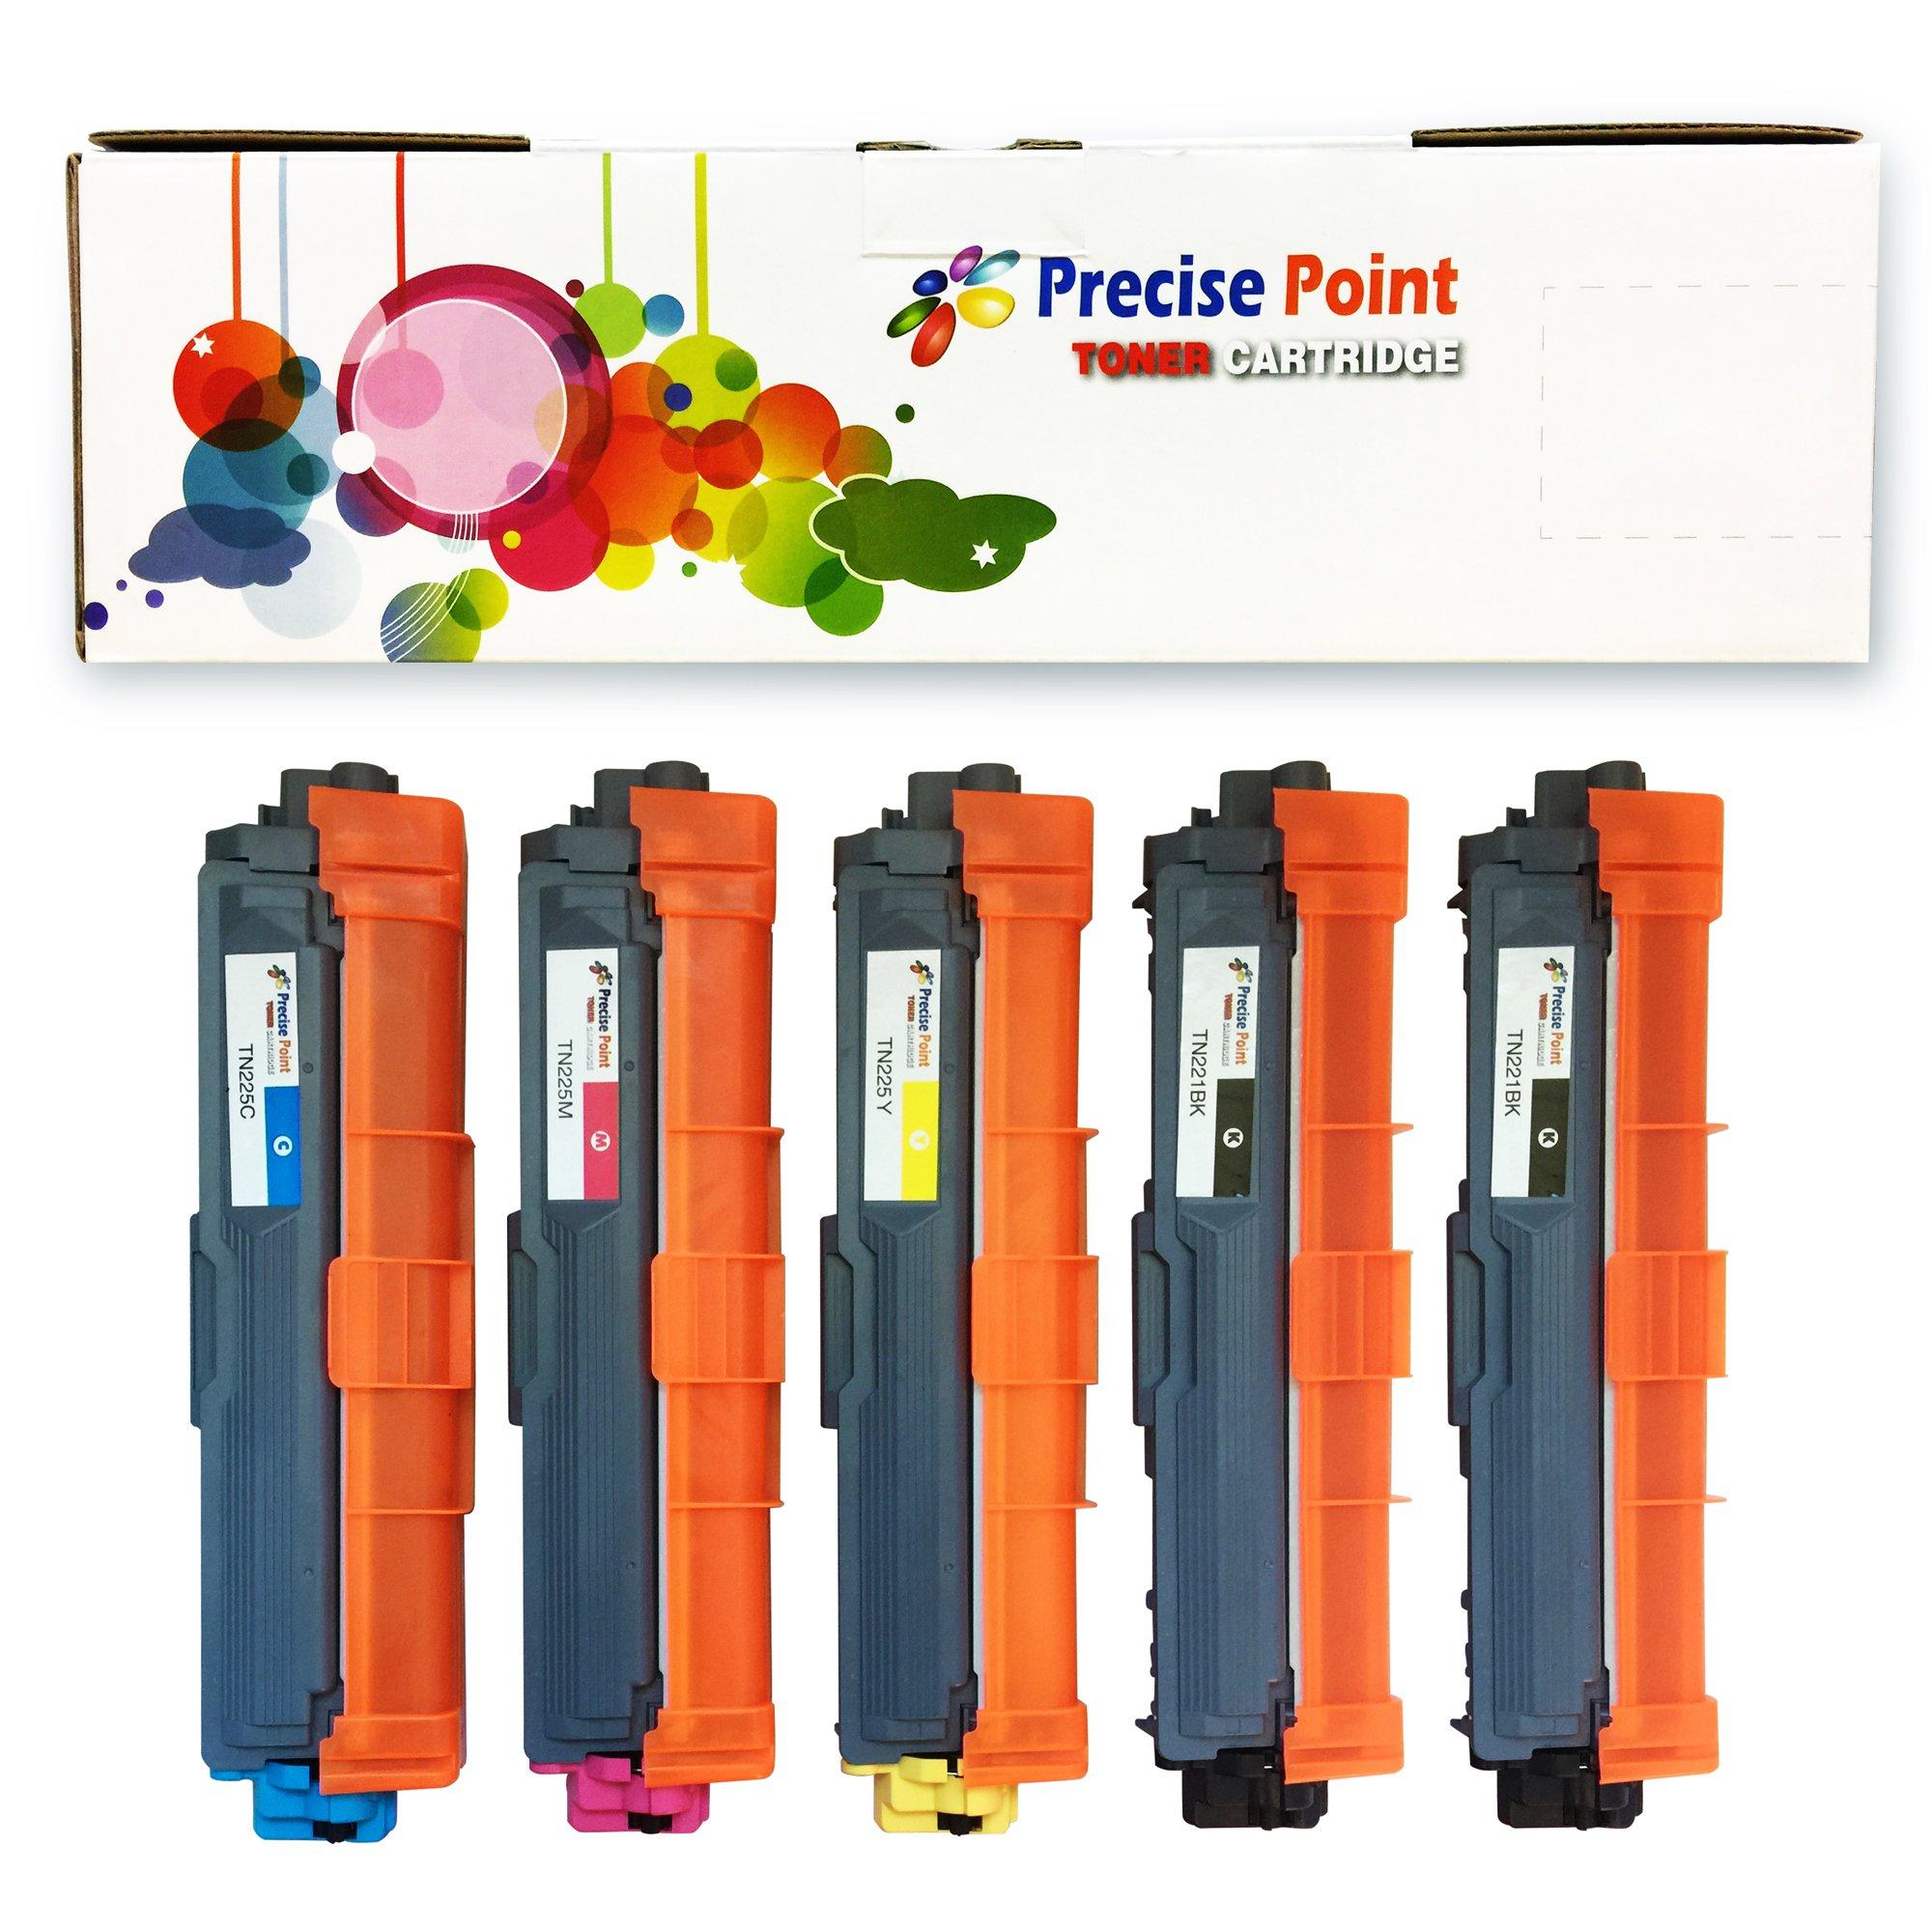 Toner Alternativo ( X5 ) 4 Colores Precise Point TN221 TN225 B / C / M / Y 2